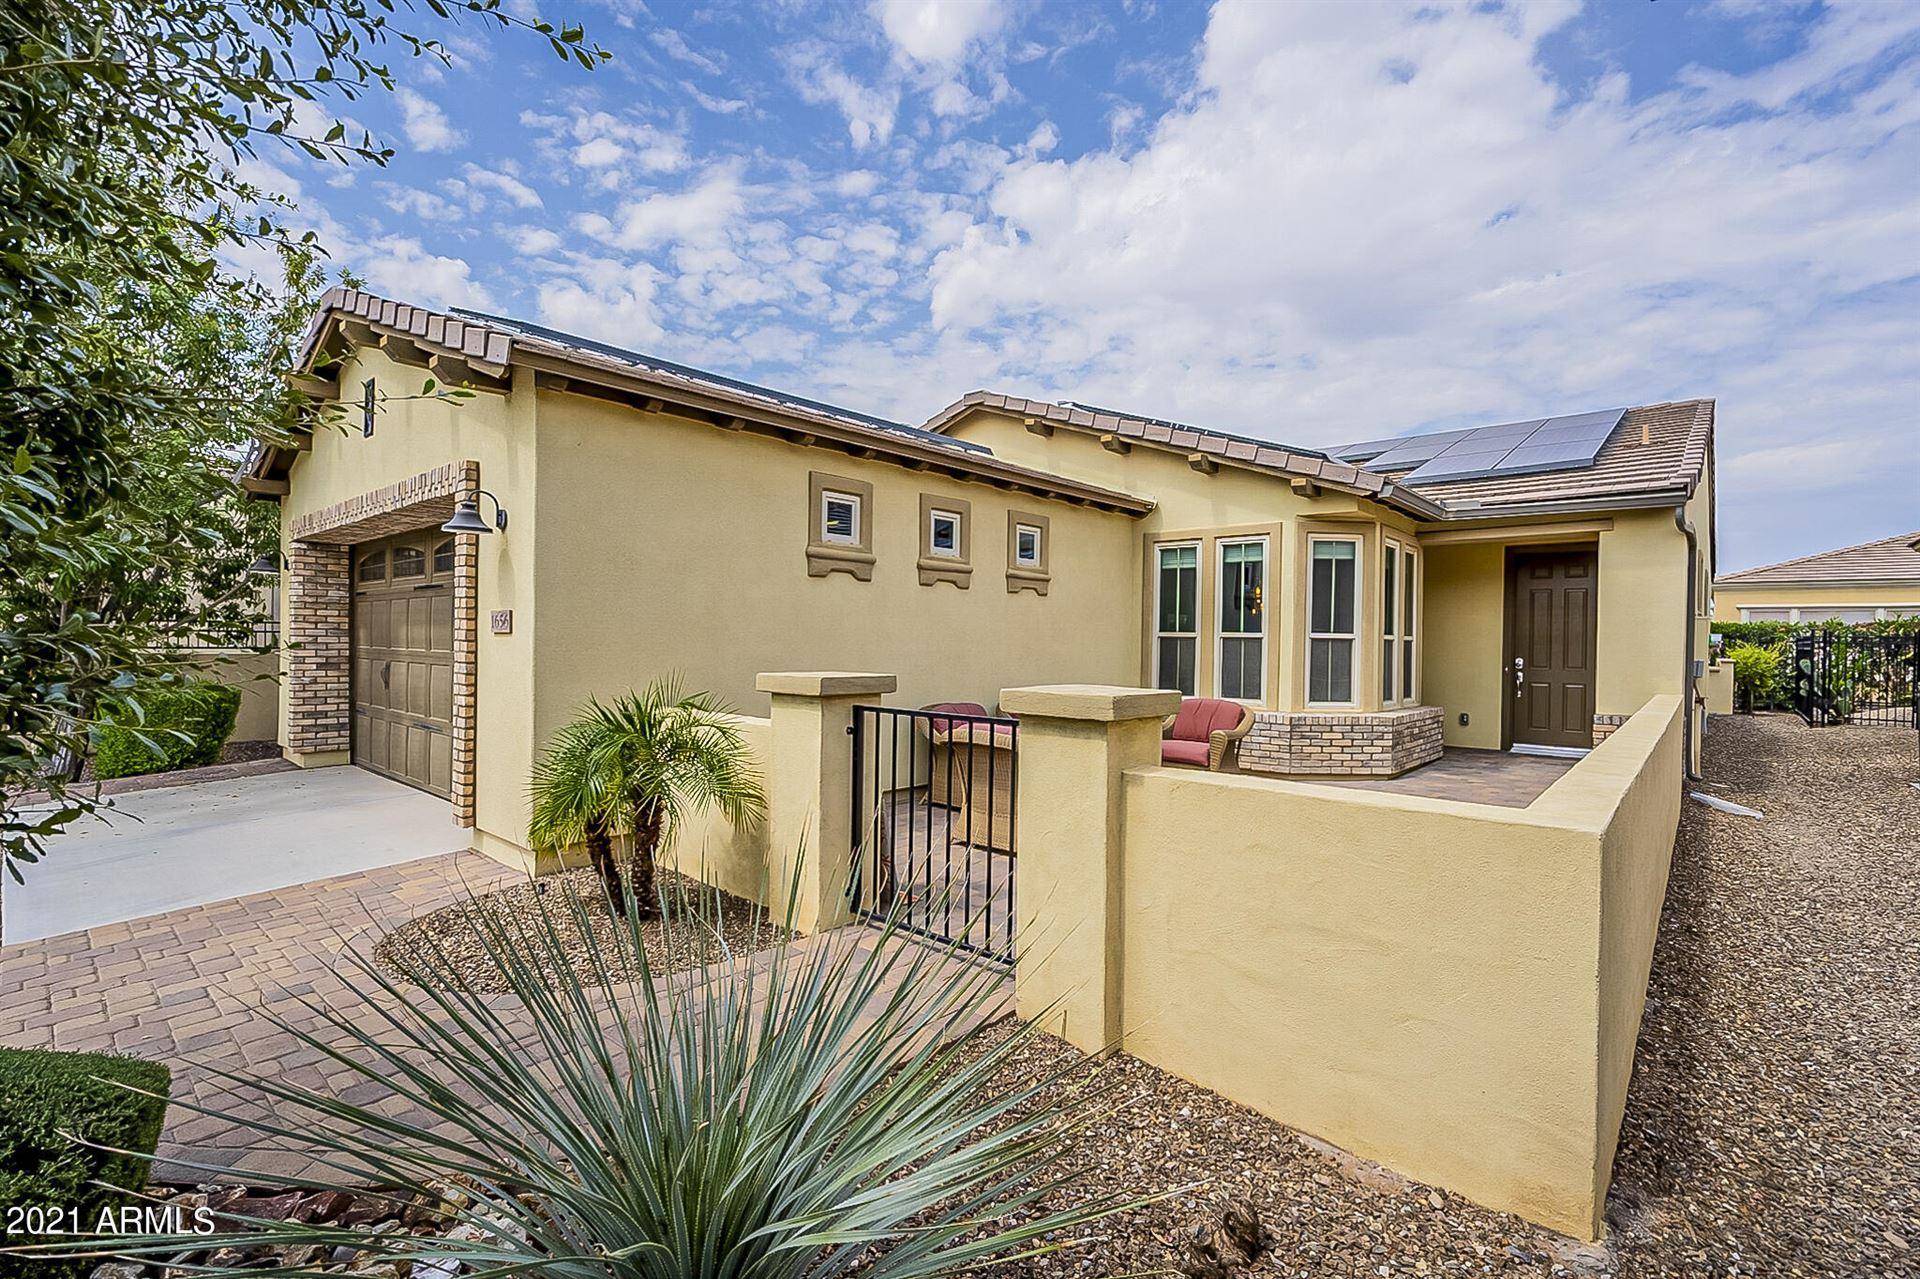 Photo of 1656 E HESPERUS Way, Queen Creek, AZ 85140 (MLS # 6295394)